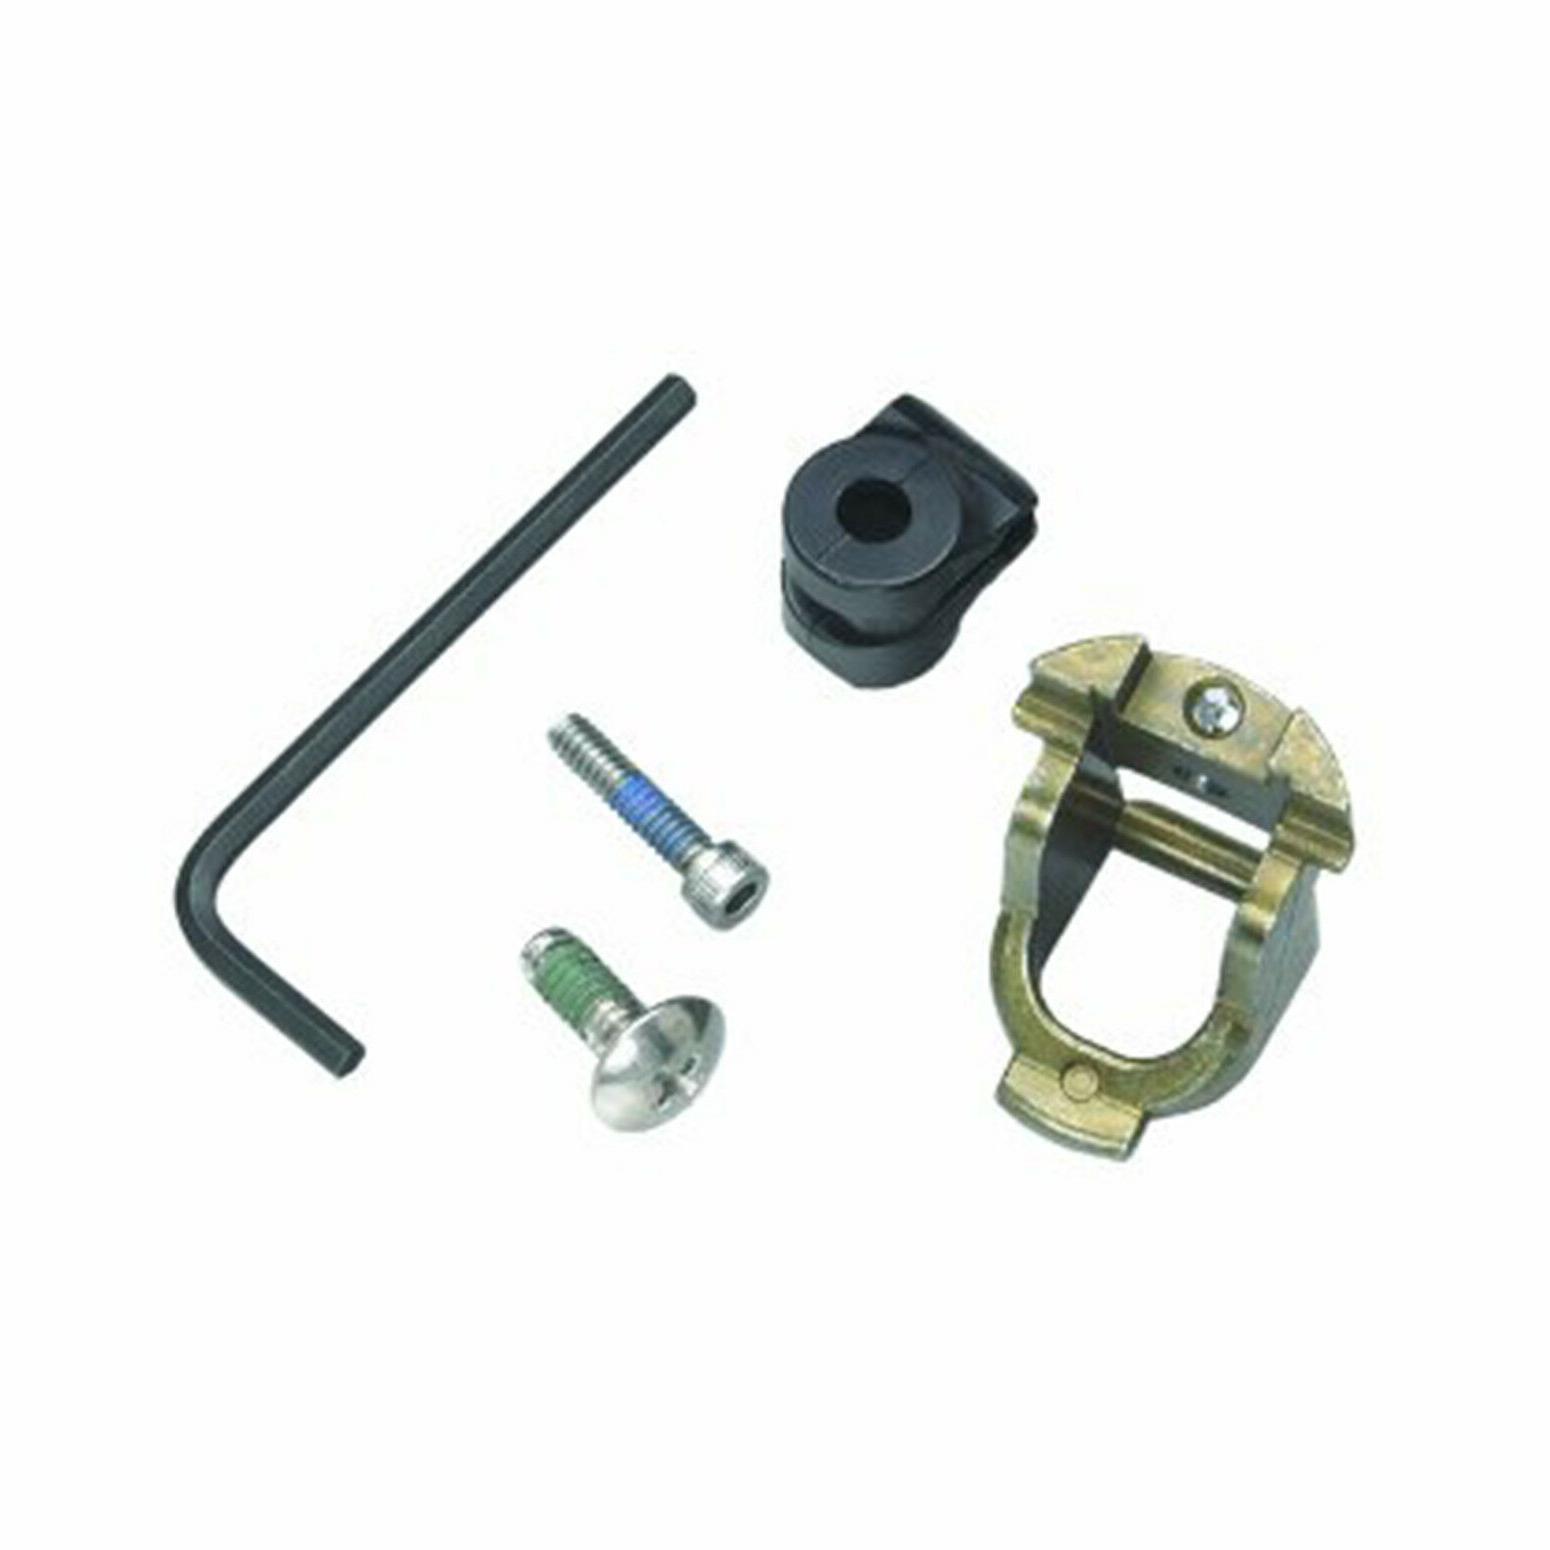 100429 Moen Replacement Parts Kitchen Faucet Adapter Kit